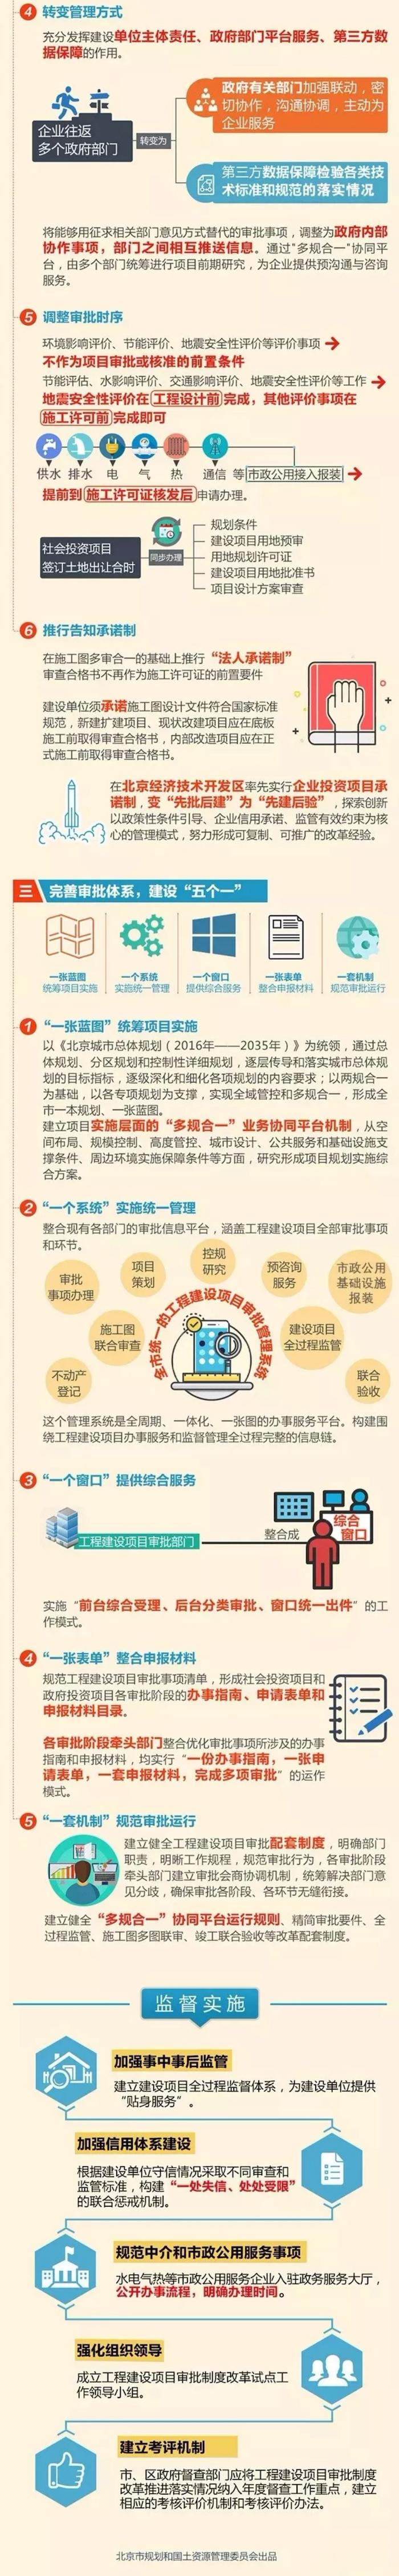 mp.weixin.qq.com_s_uUD-zlG7Raj3XUl_5WFZew(iPad Pro)02.jpg